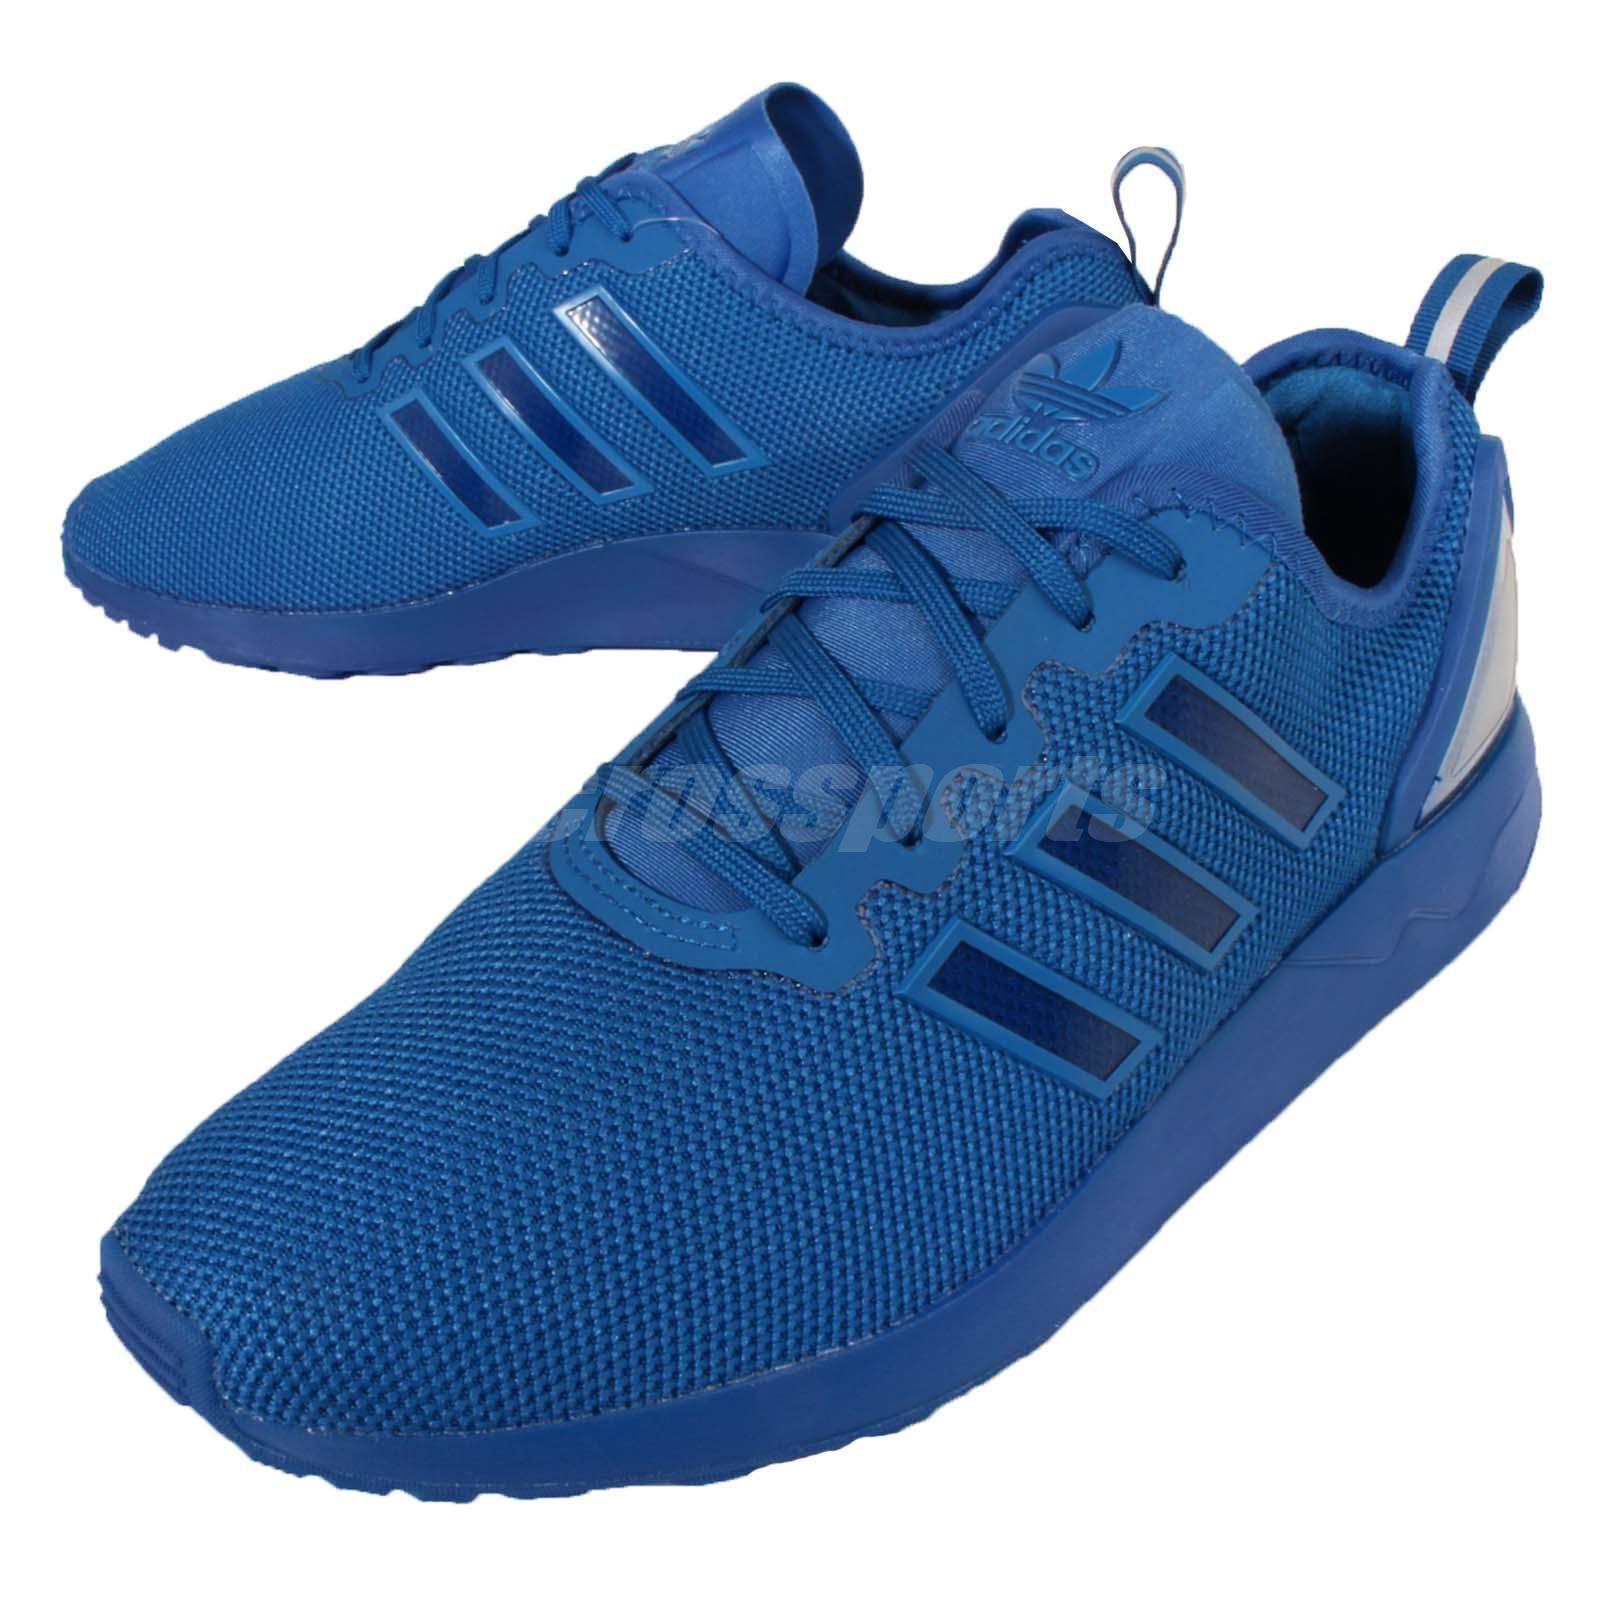 adidas originali zx flusso avanzata mens scarpe blu.